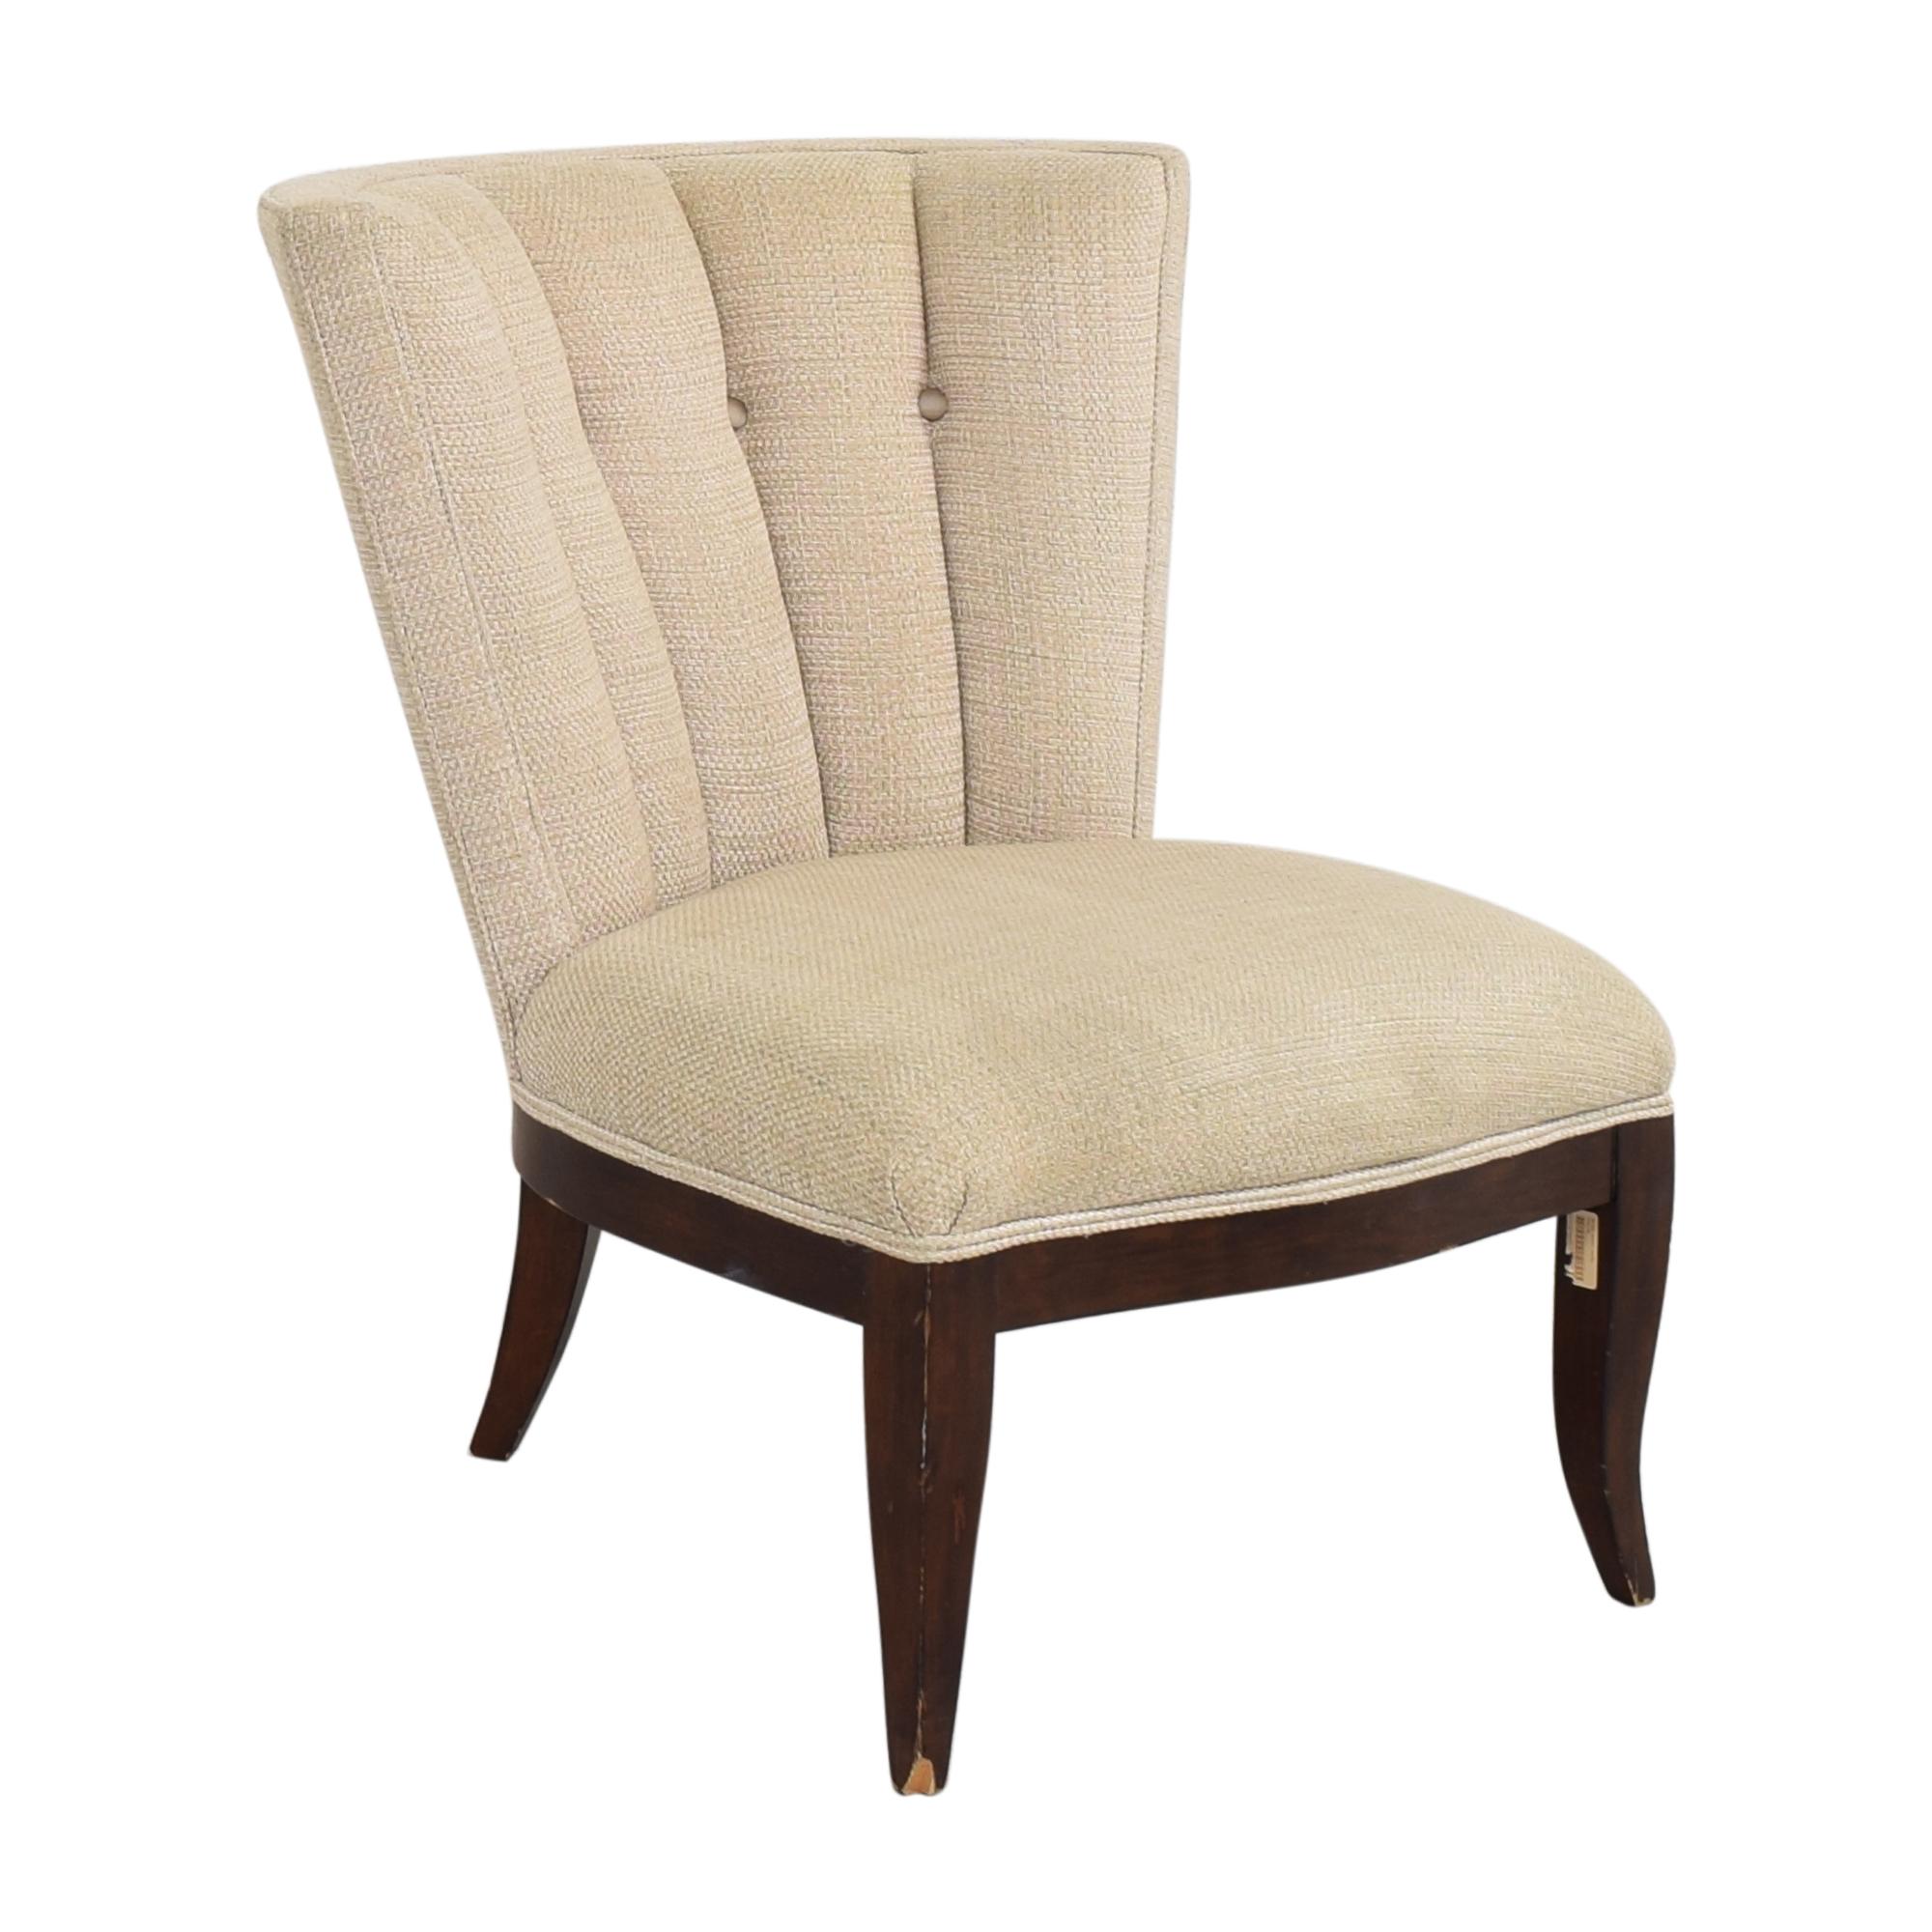 Schnadig Ava Chair sale